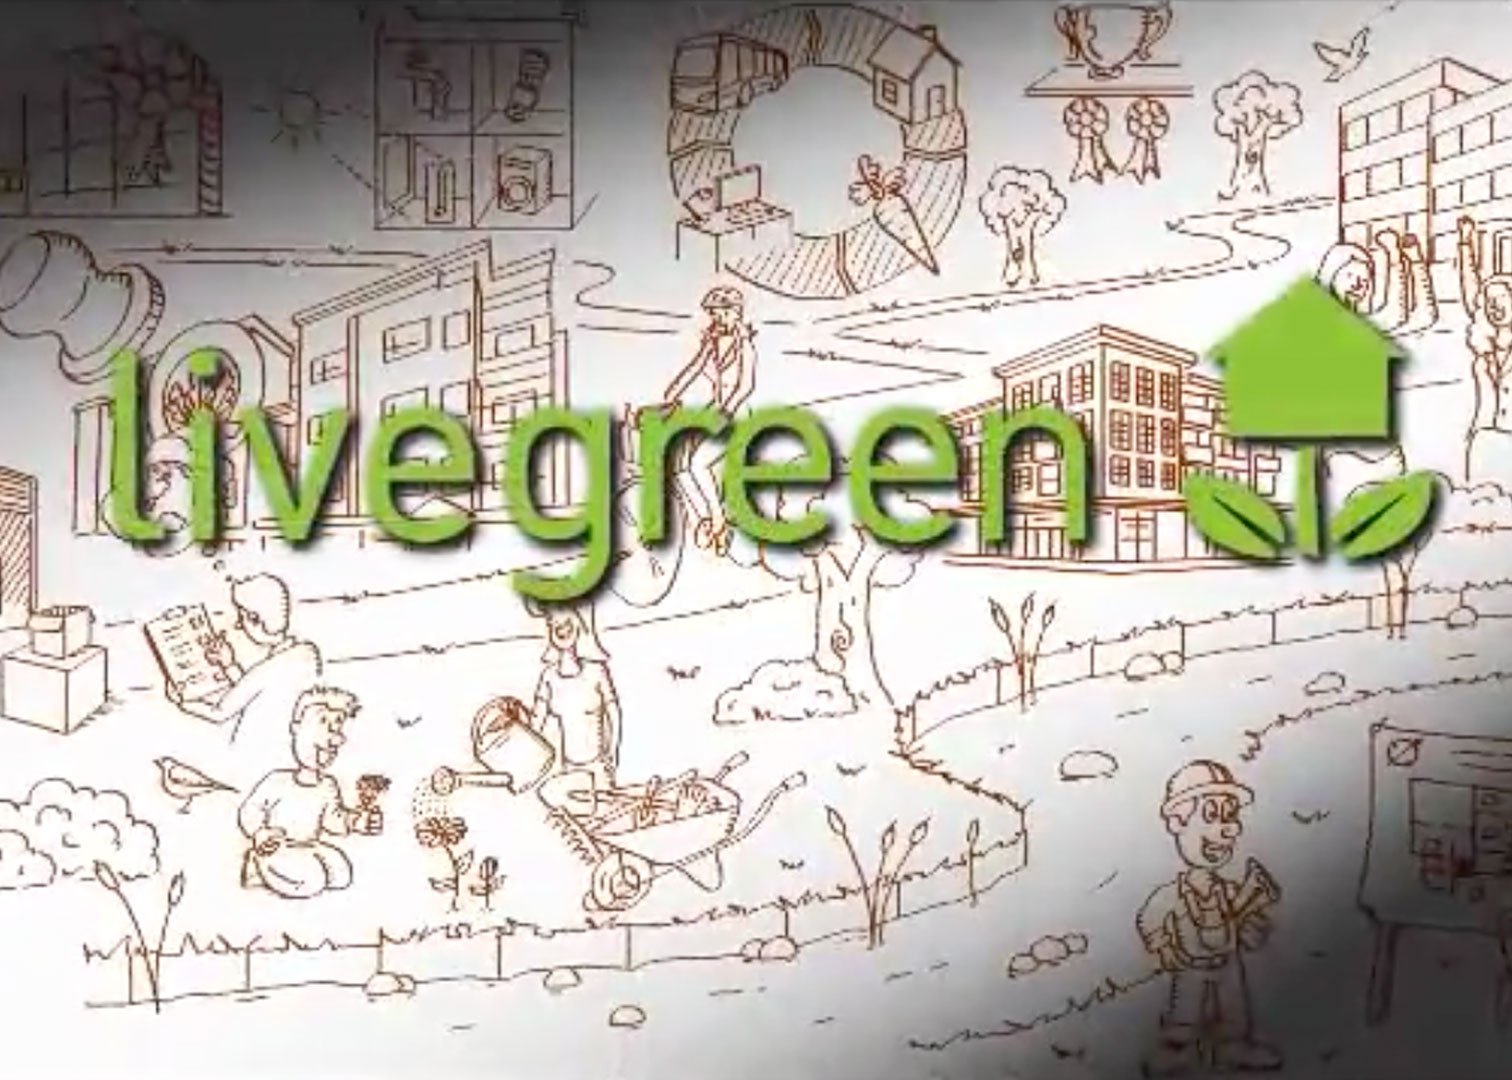 Livegreen: BC Housing is greenest employer 2016